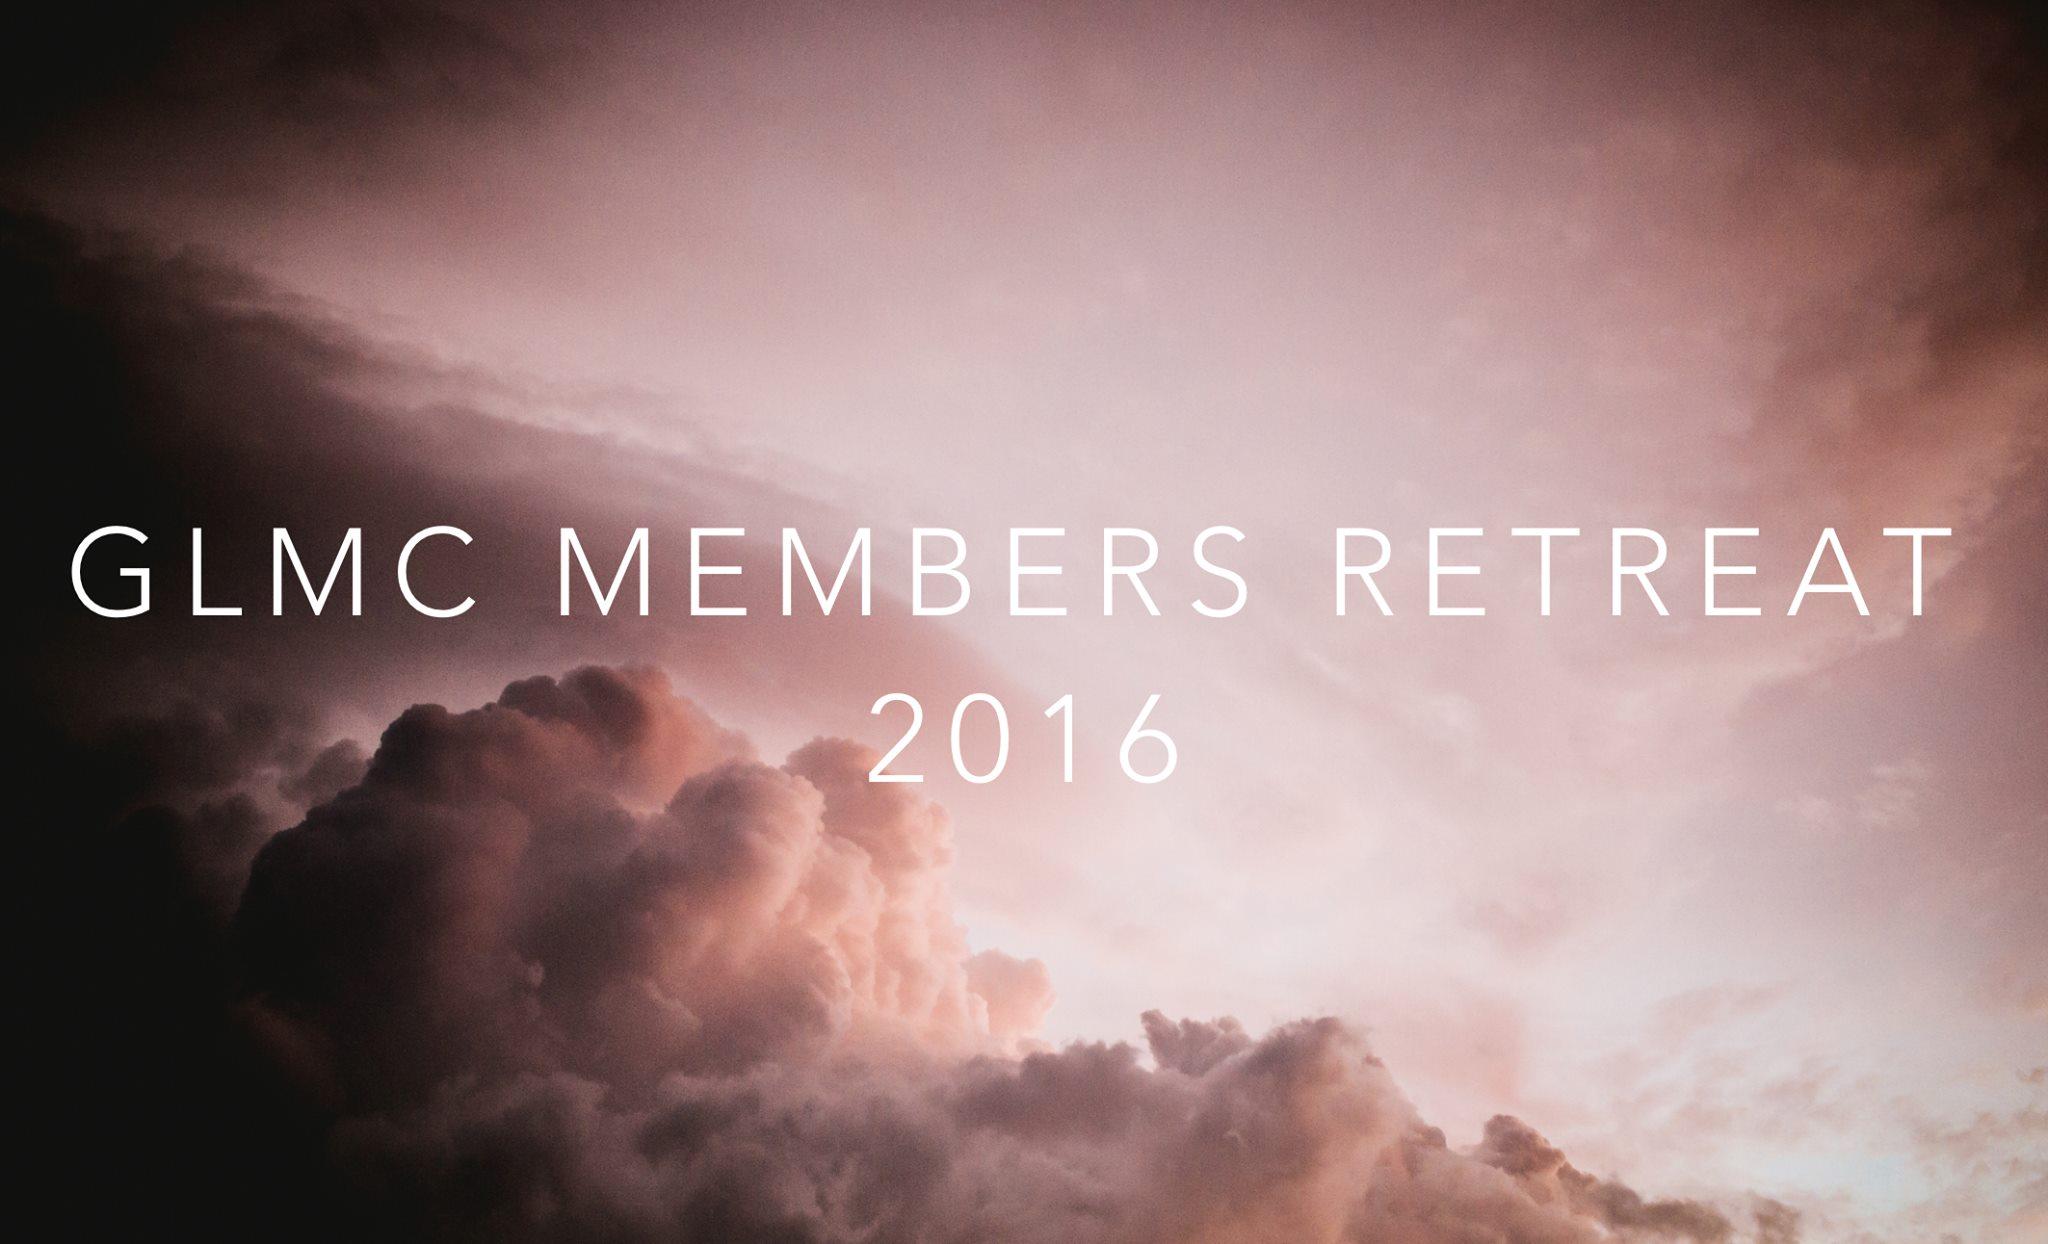 GLMC Members Retreat 2016